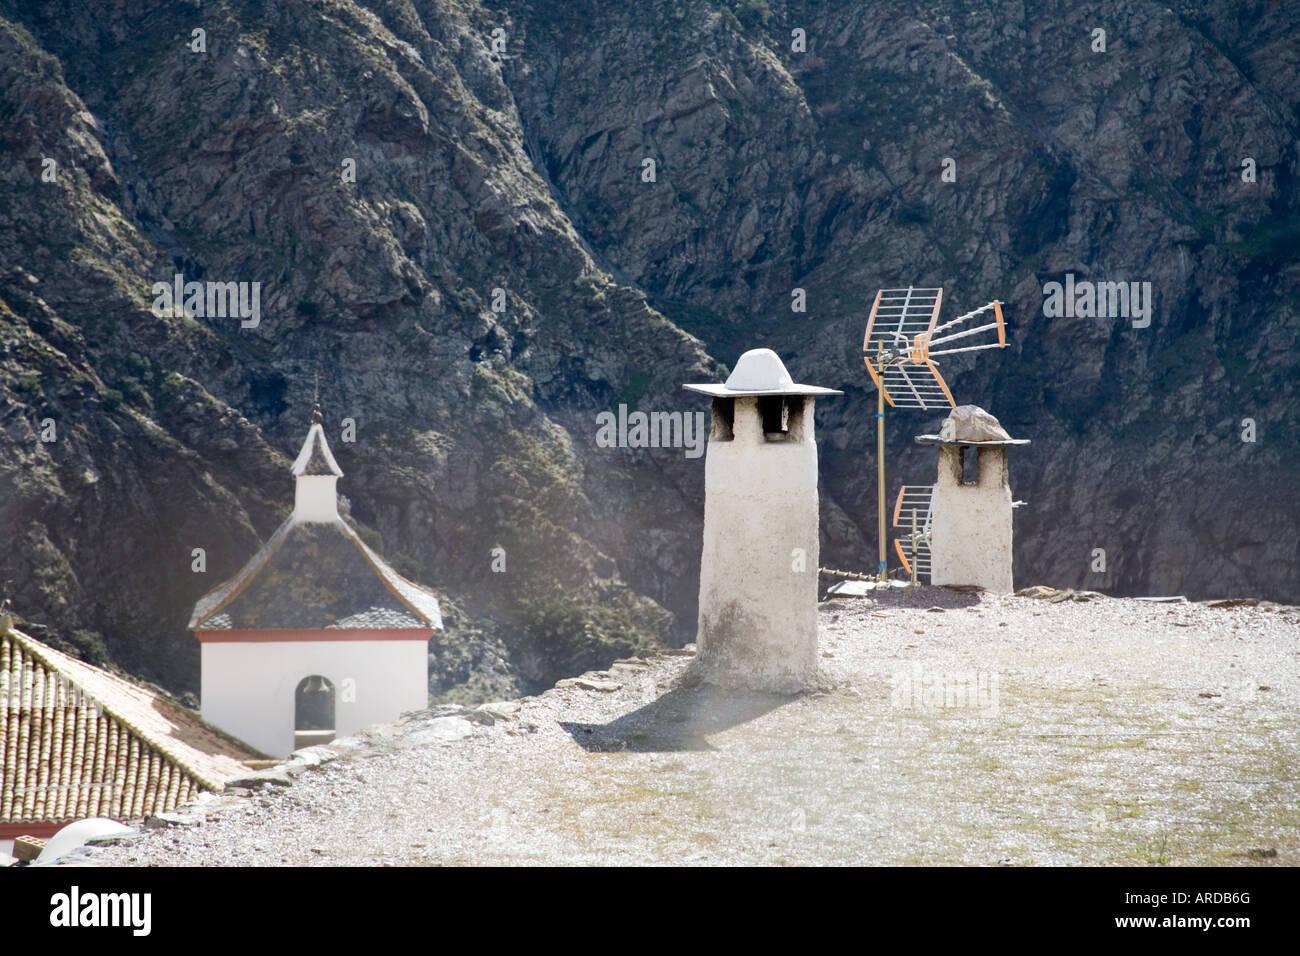 Andalucian chimney pots Las Alpujarras Spain - Stock Image